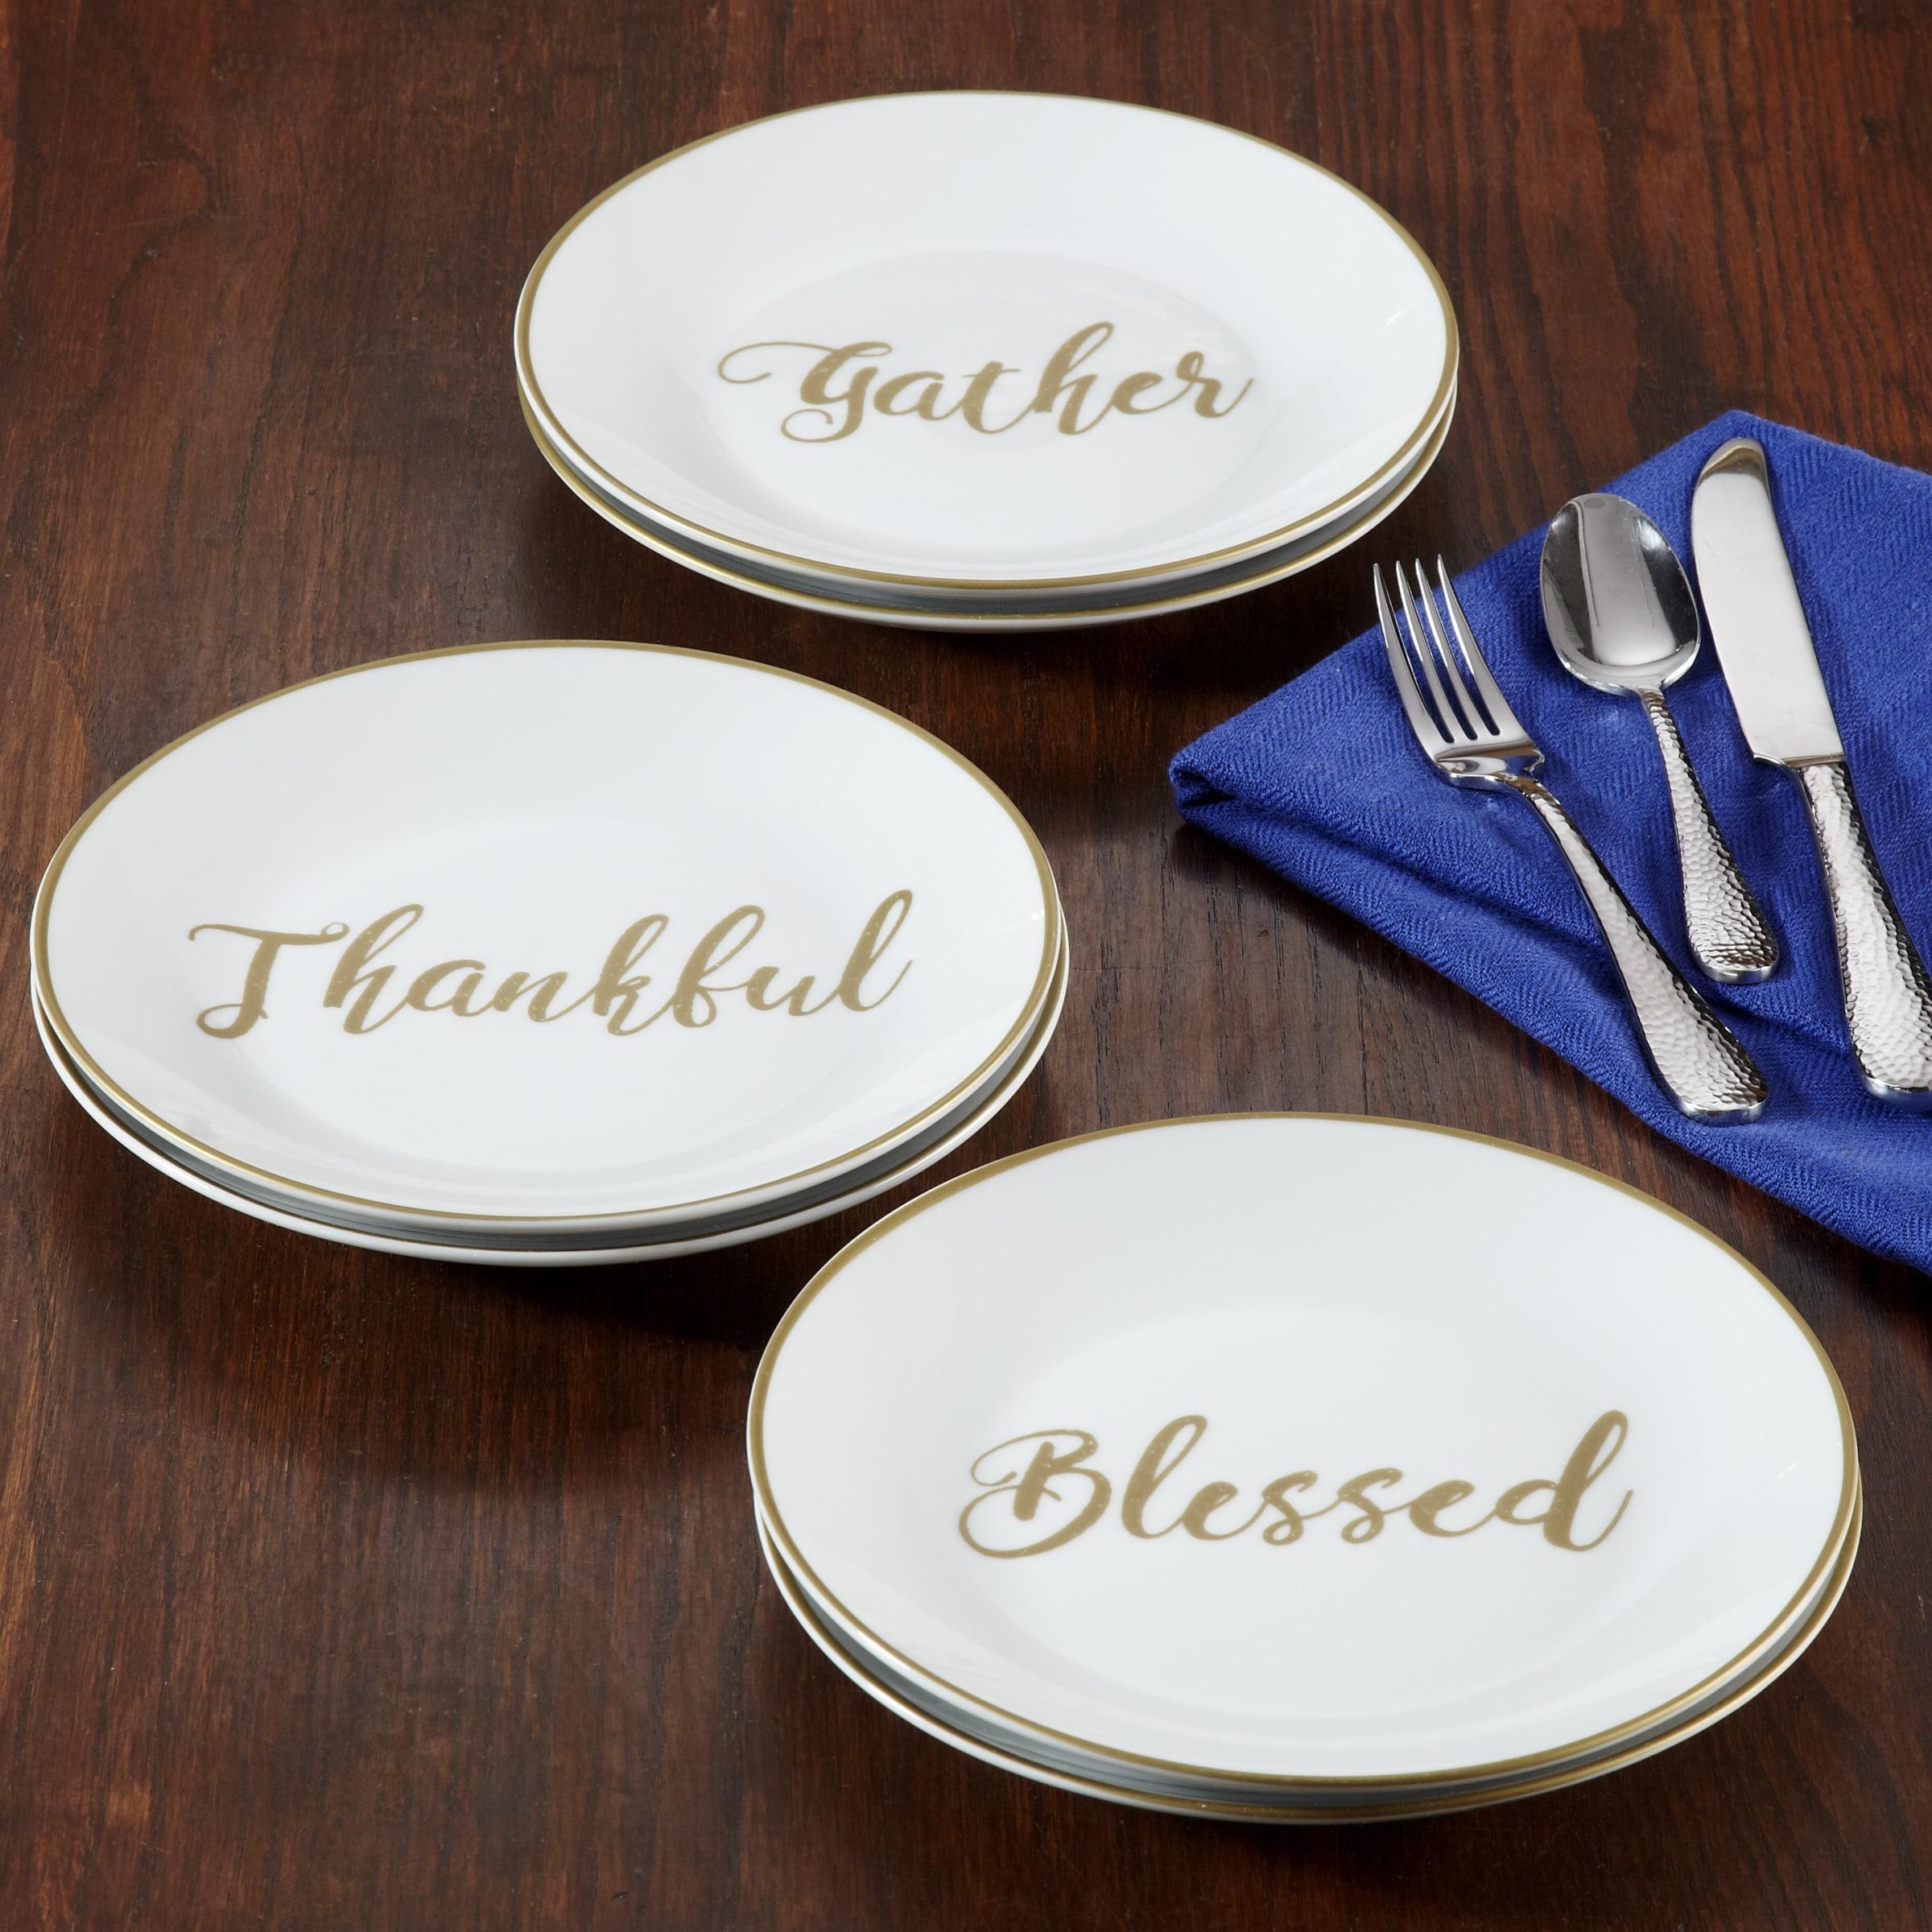 Better Homes & Gardens Sentimental Collection Appetizer Plates, Assorted Sentiments, Set of 6